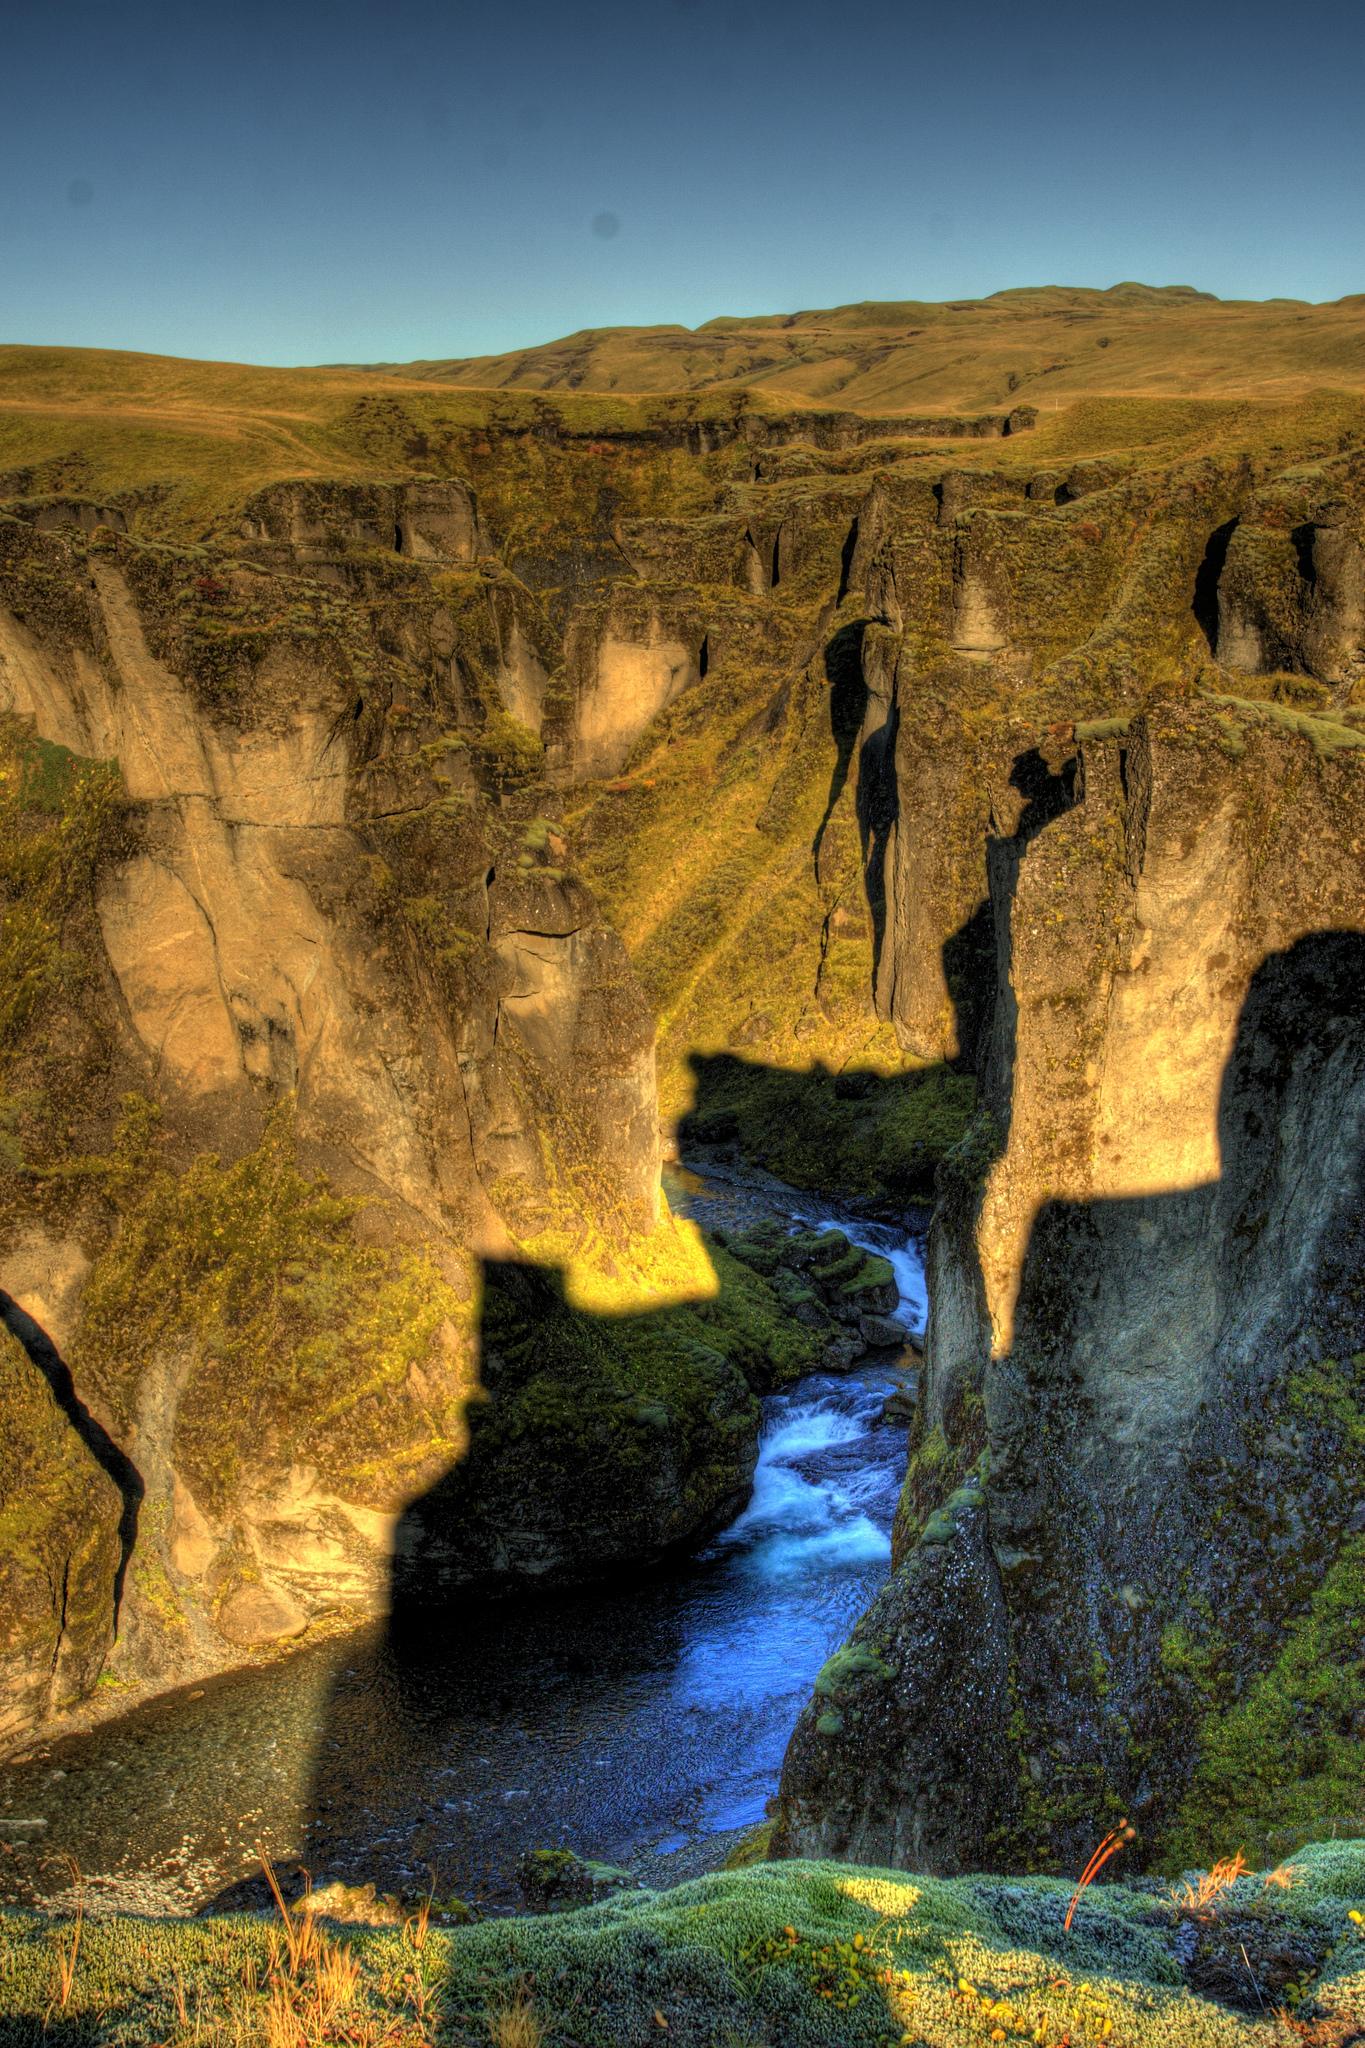 Fjadrargljufur. Iceland 6 - YourAmazingPlaces.com